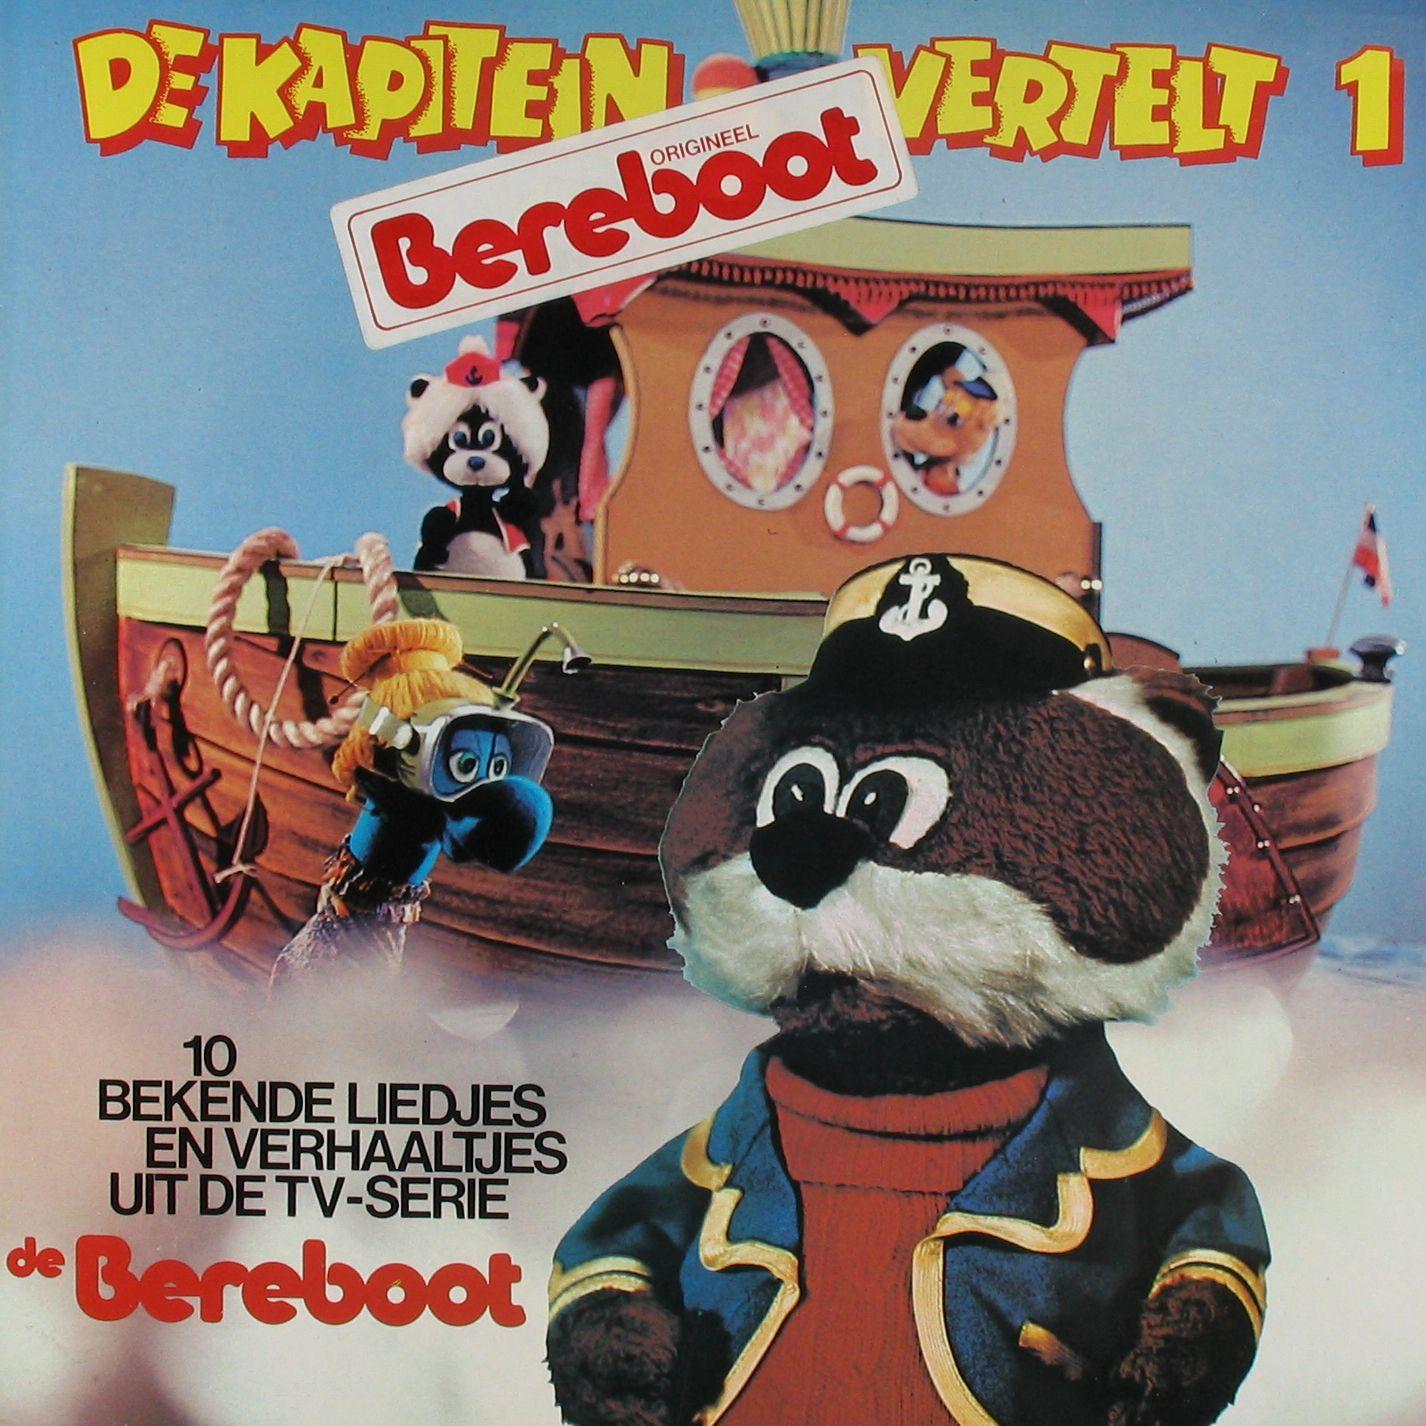 berenboot de kapitein vertelt nostalgie